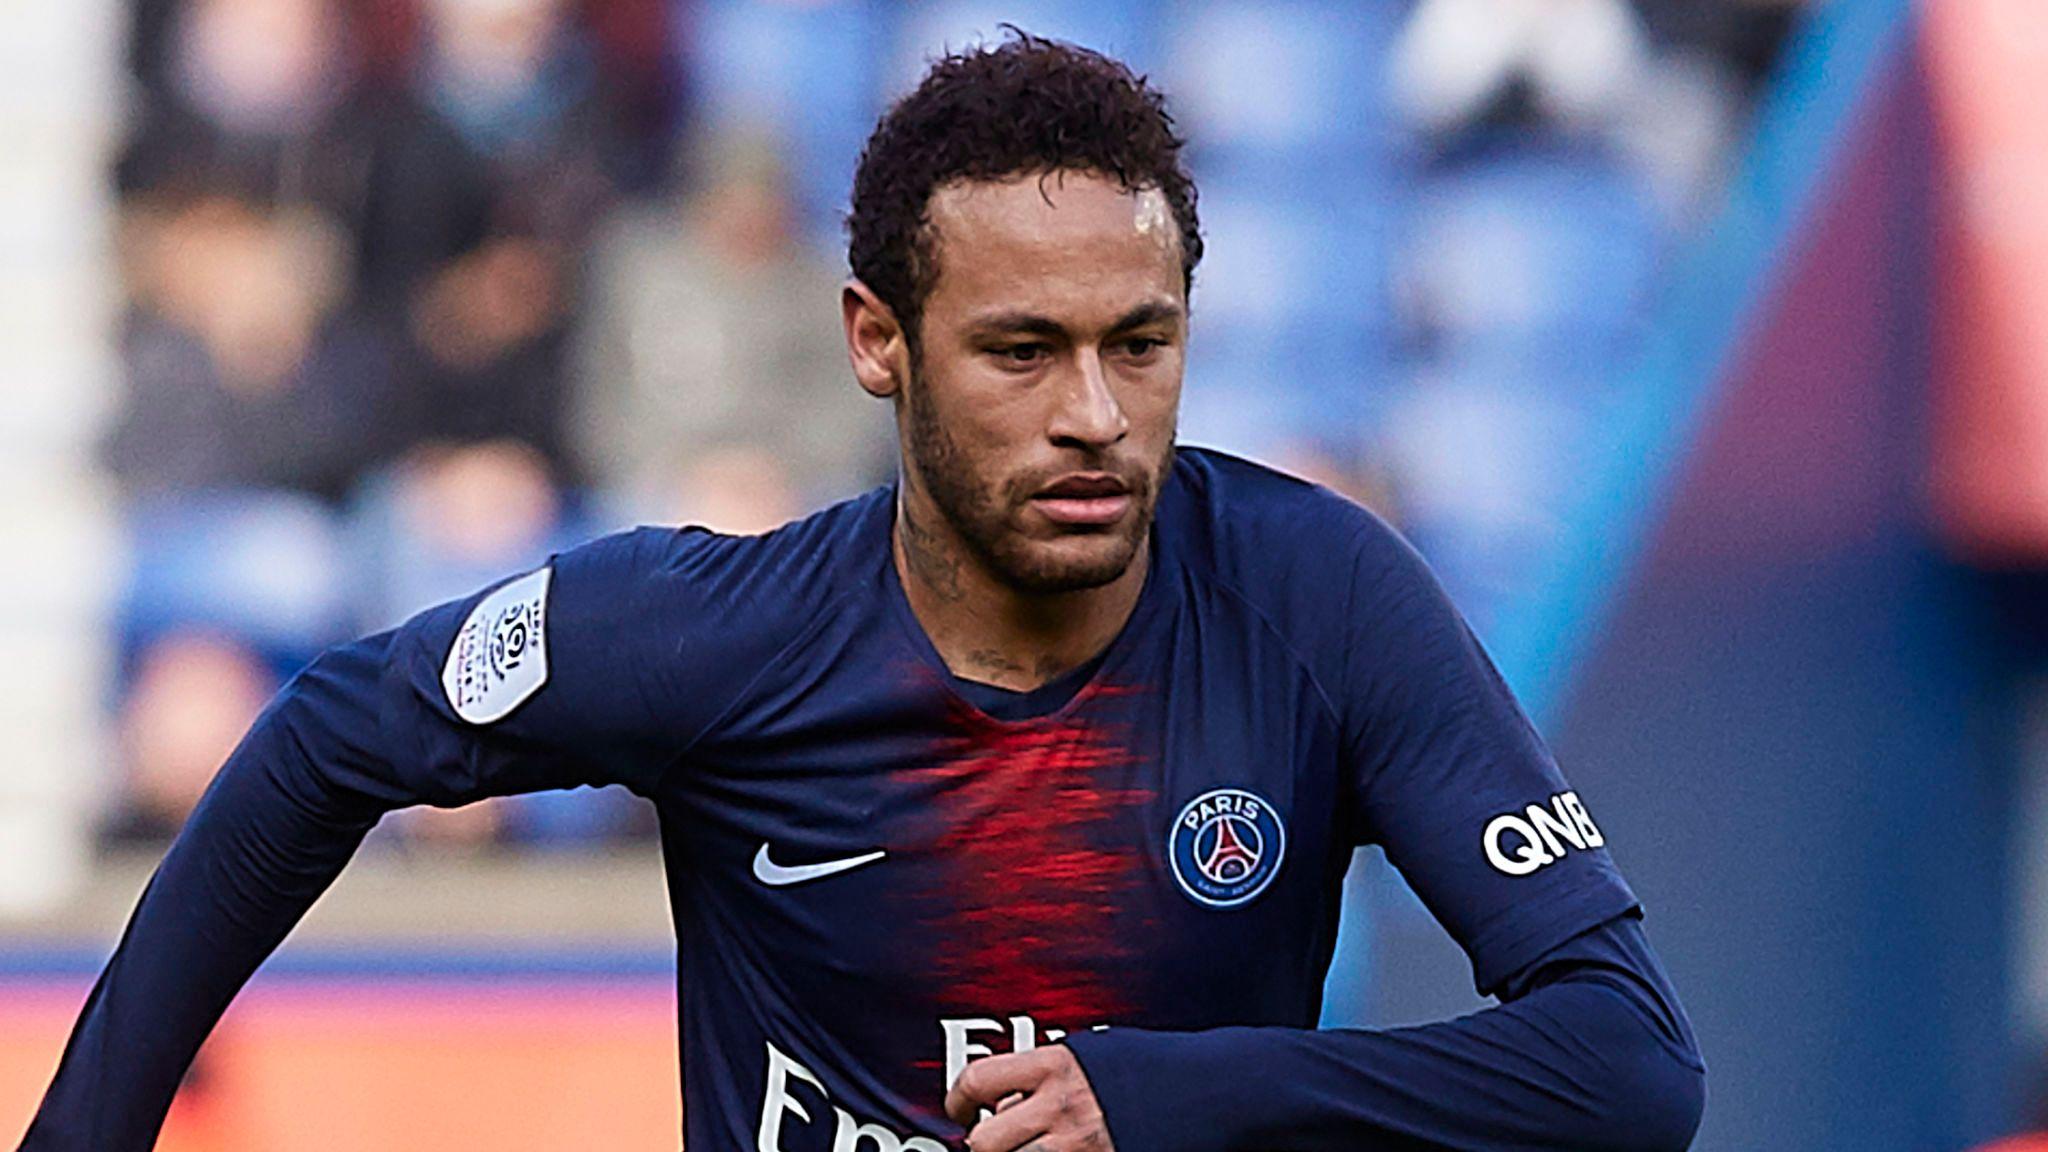 Neymar si offre alla Juventus